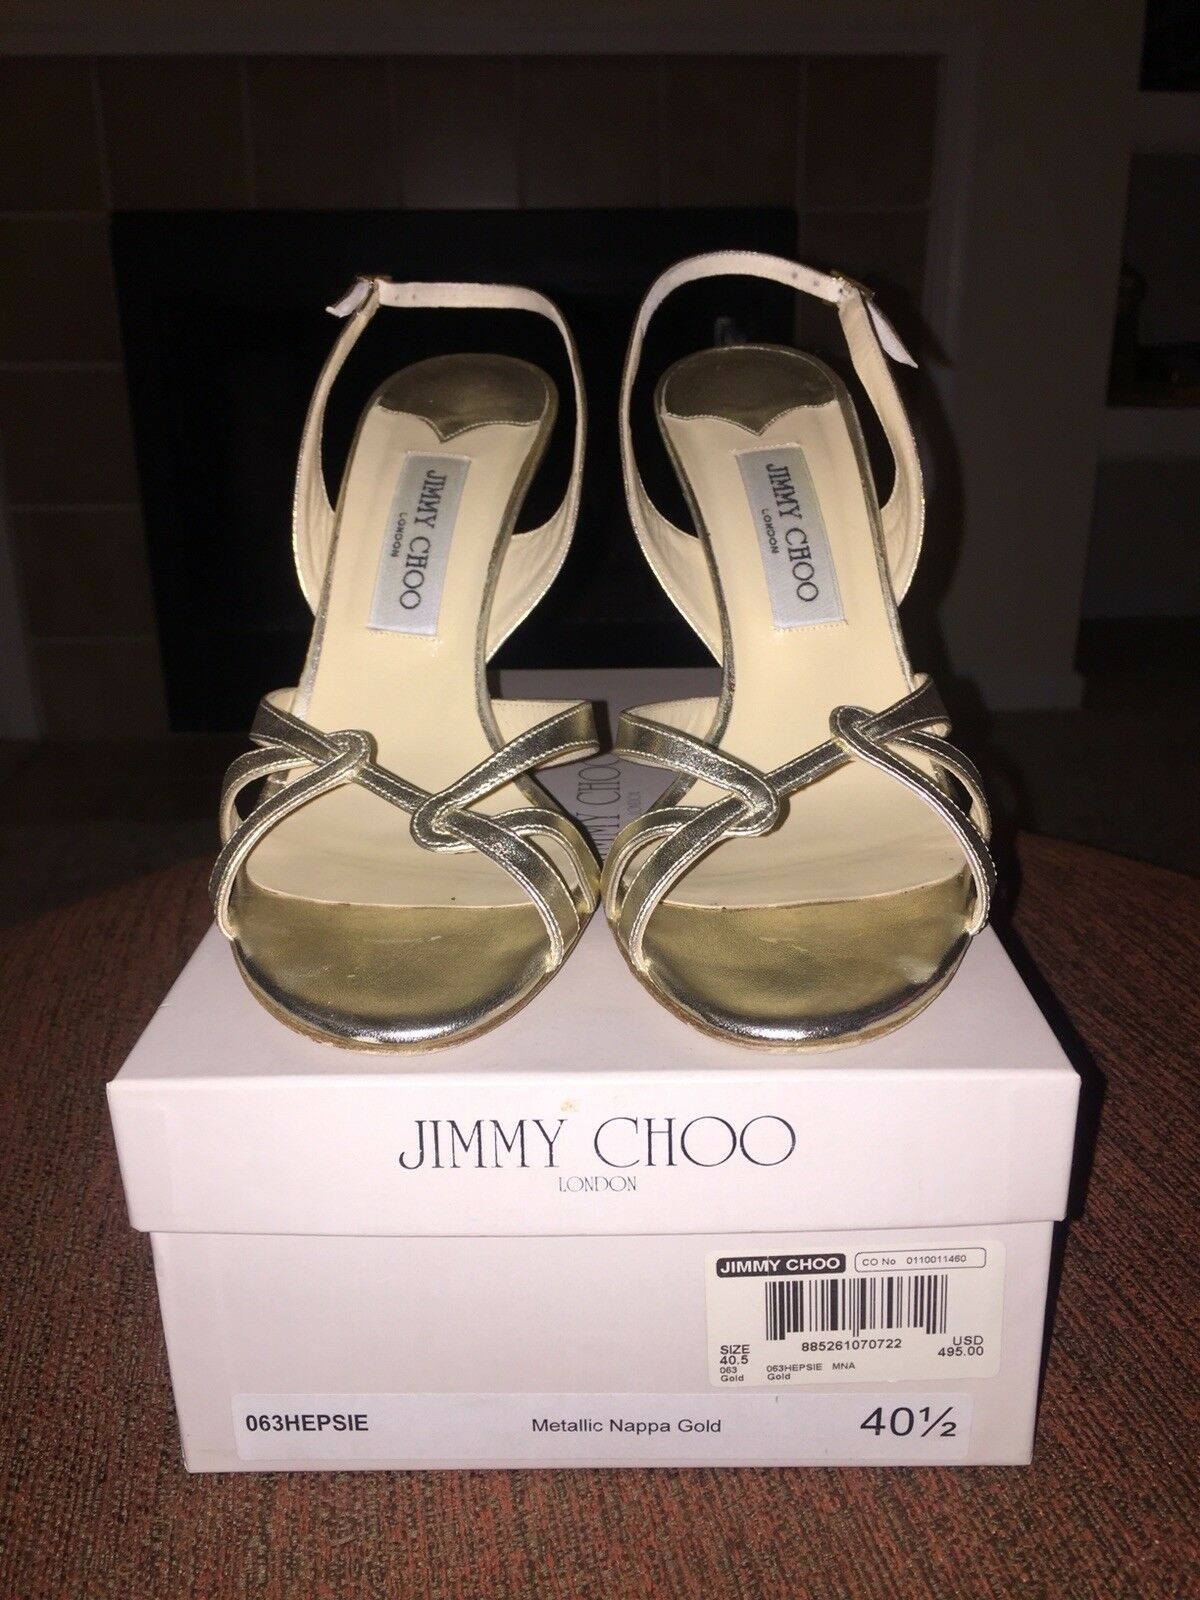 Jimmy Choo 40.5 Hepsie, slingback sandal - gold